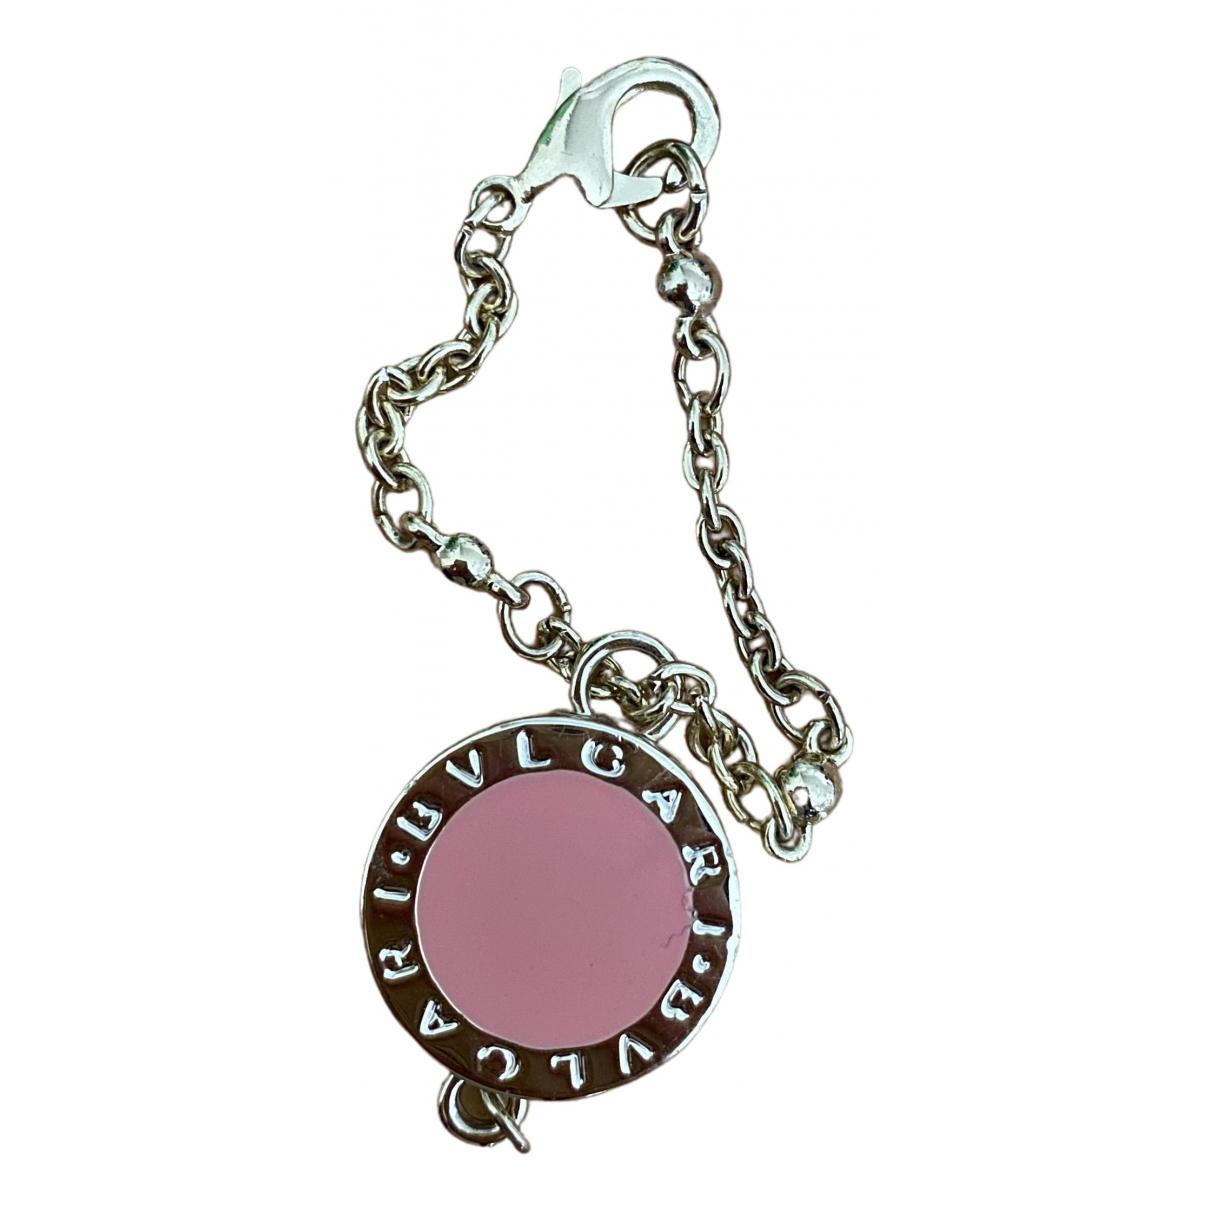 Bvlgari \N Pink Metal pendant for Women \N